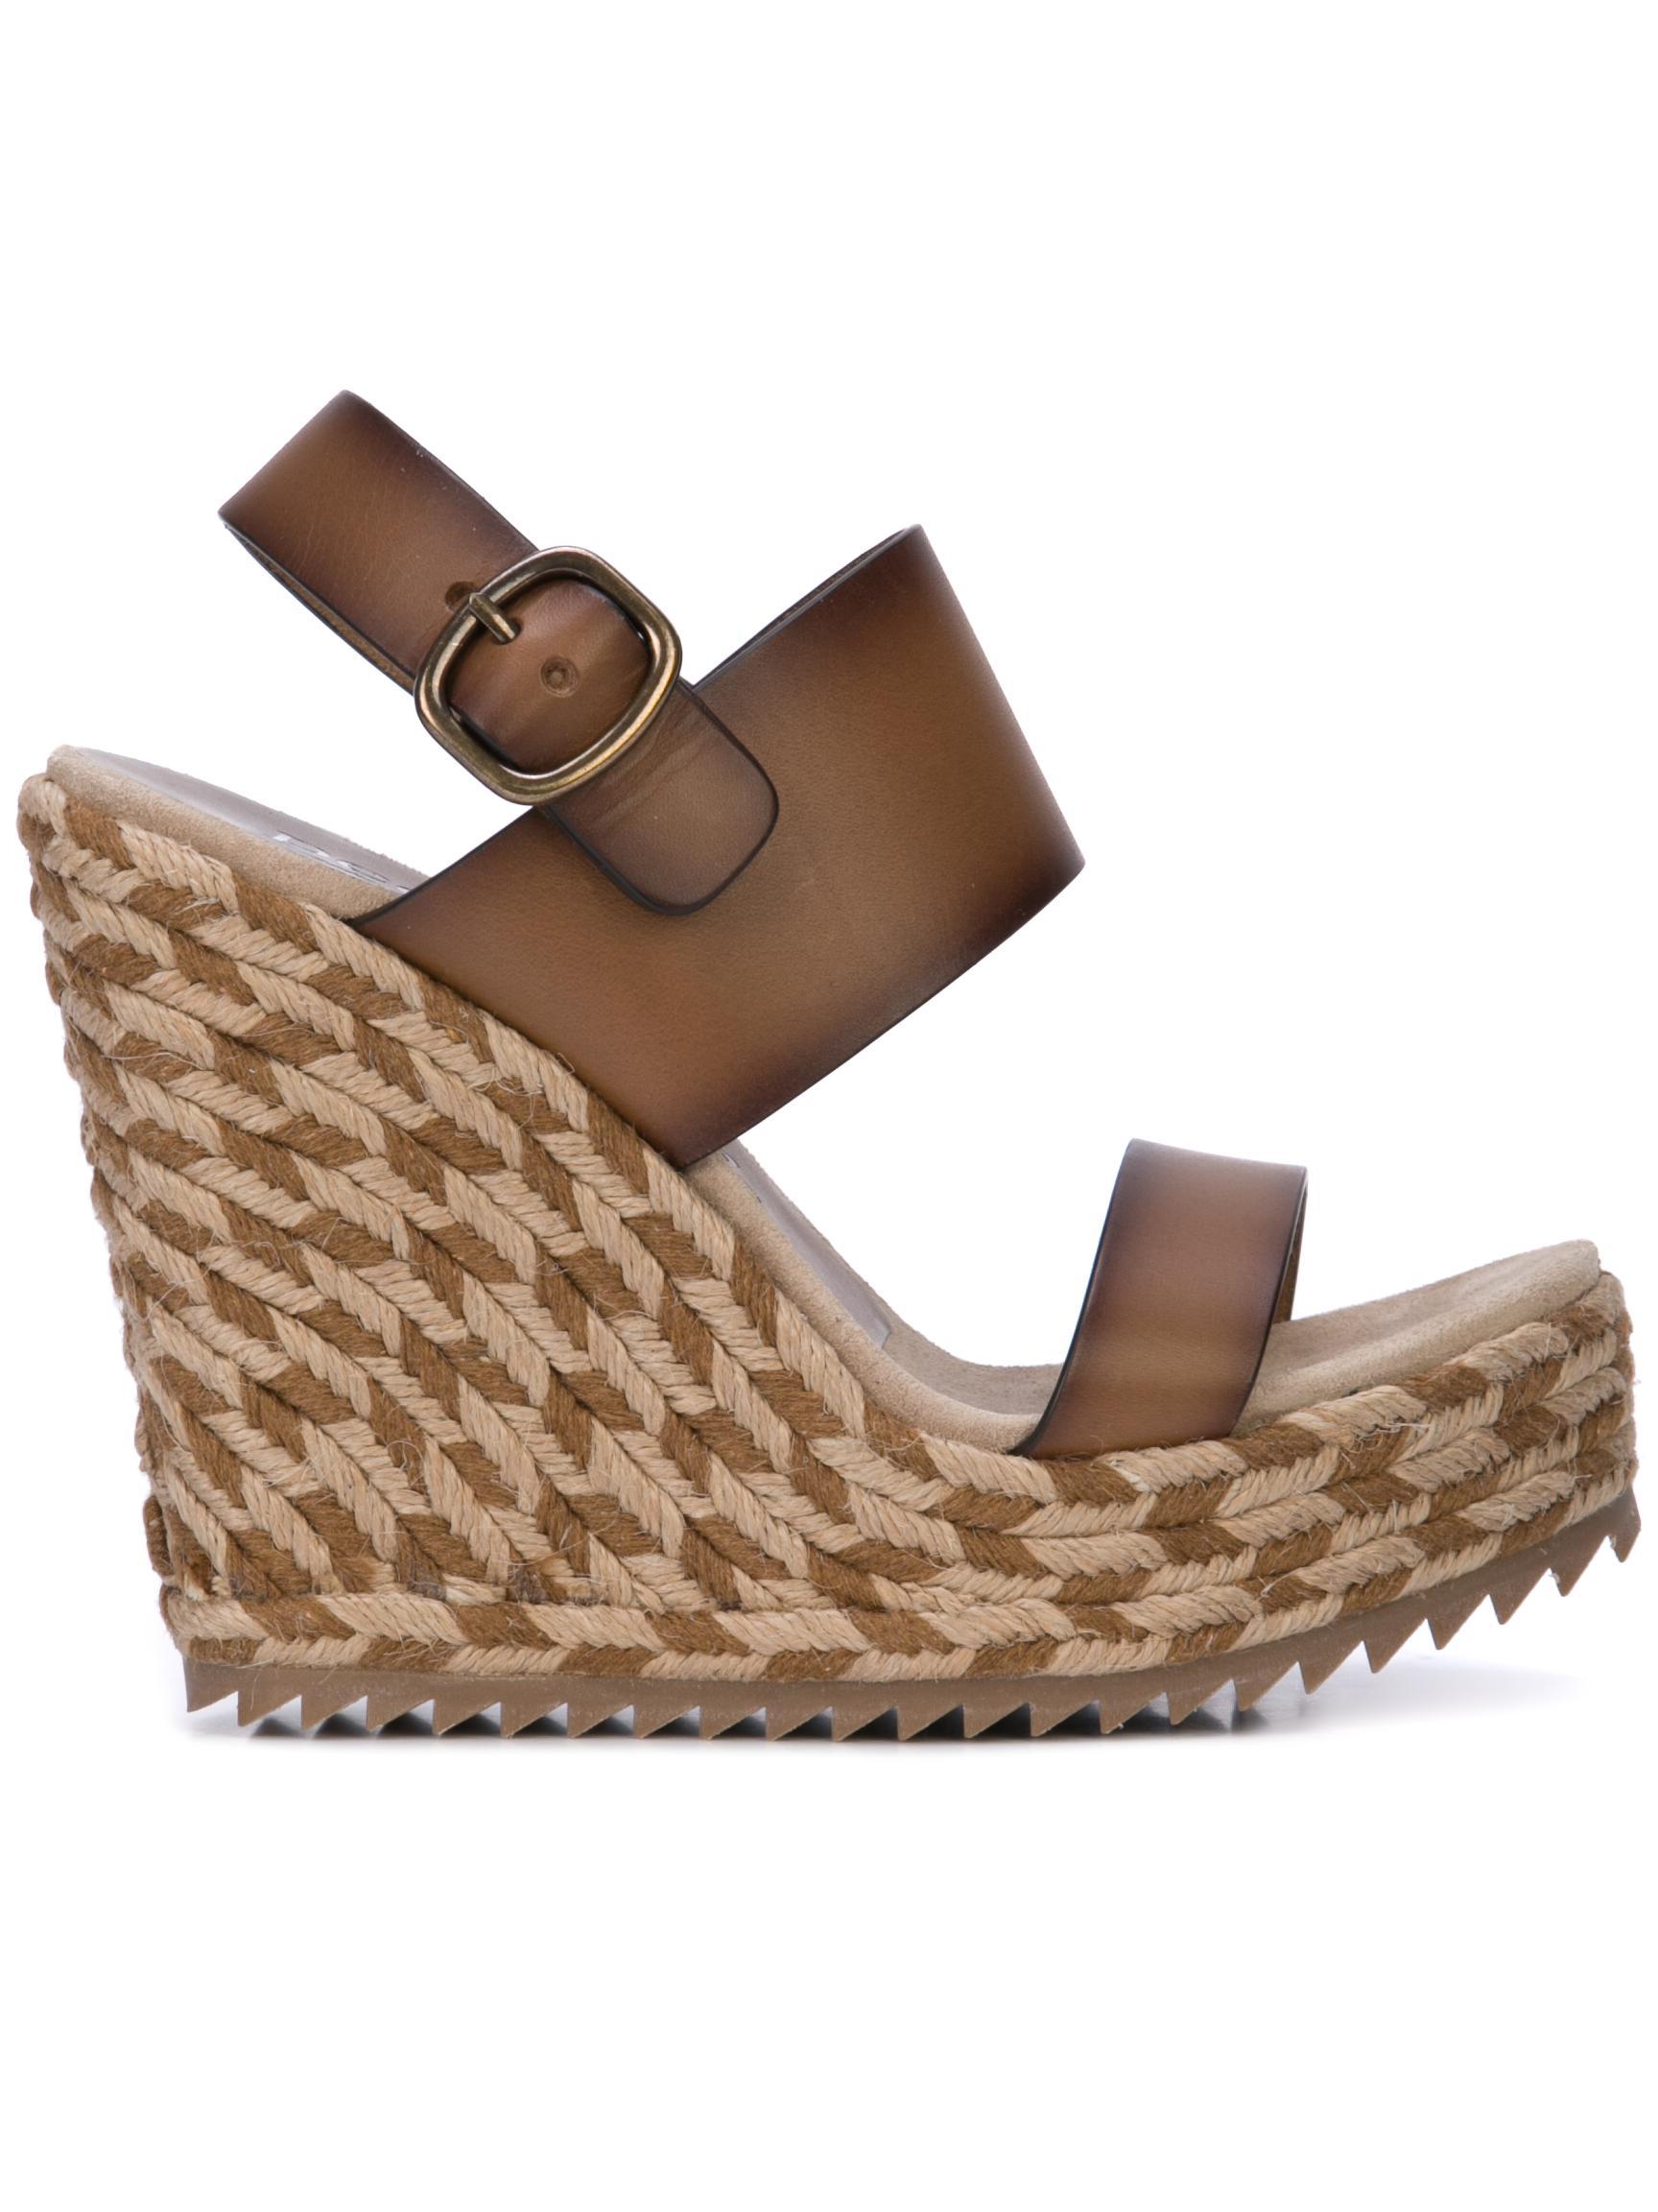 Woven Wedge Platform Sandal With Sling Back Item # TAIT